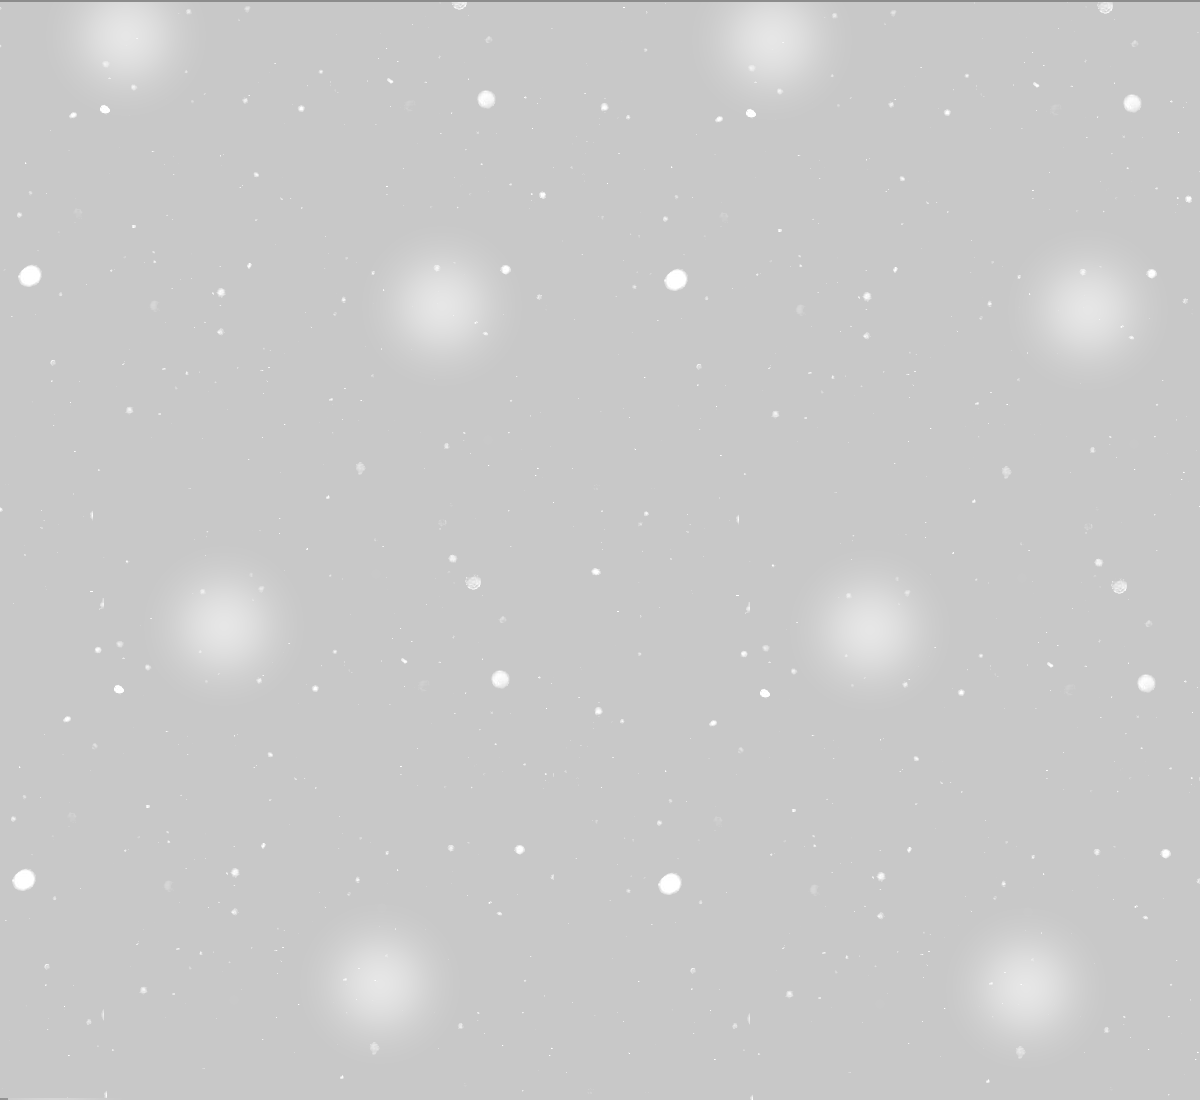 grey background tumblr - photo #9